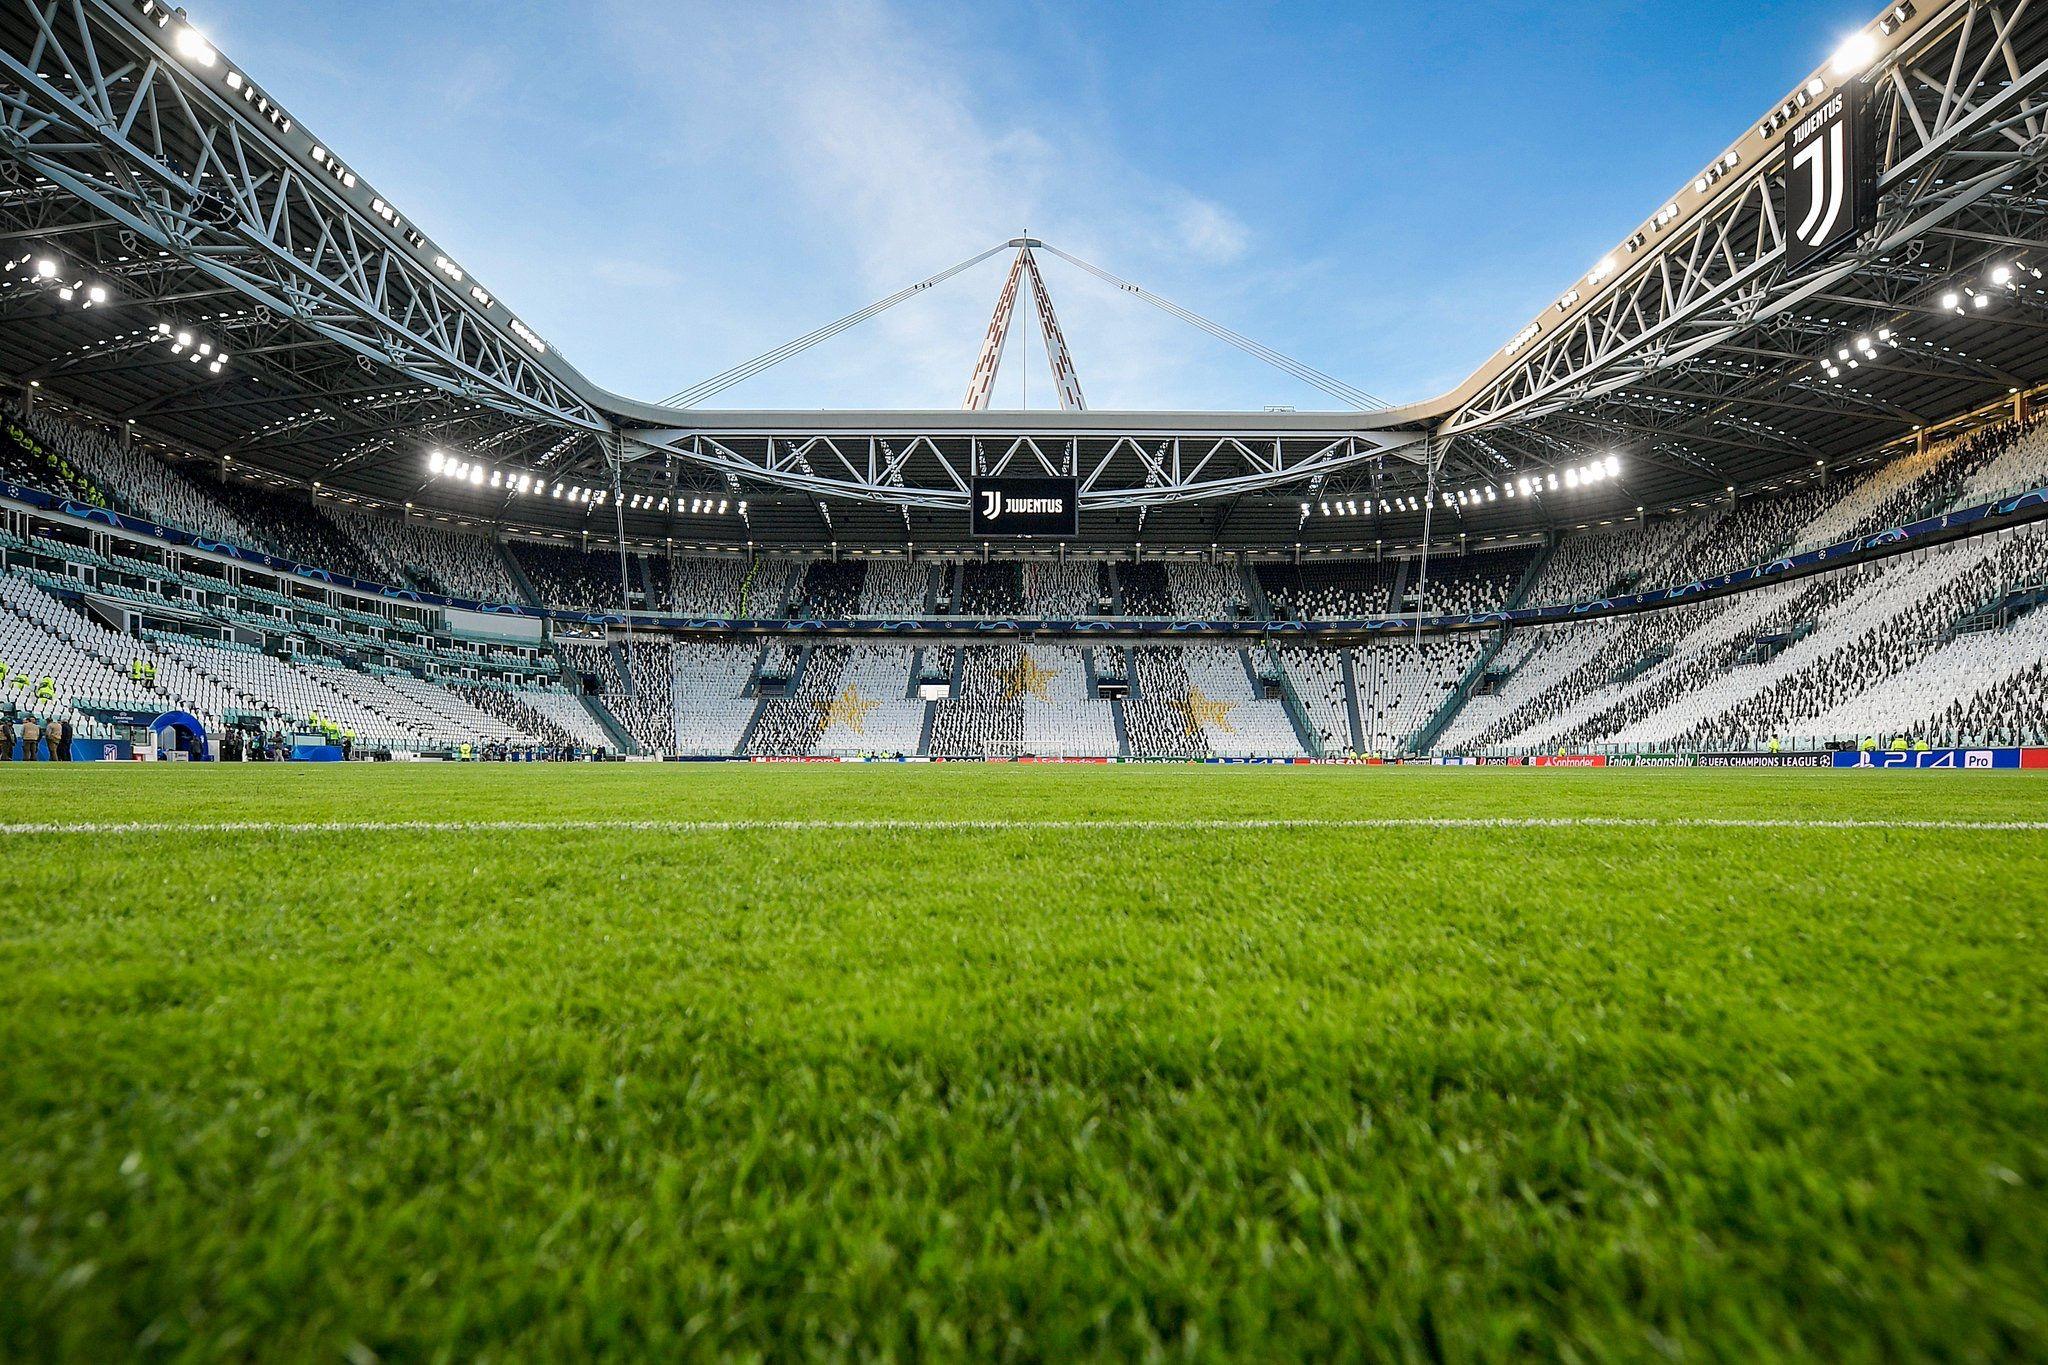 Pin Oleh Manuel Van Buyten Di Allianz Stadium Olahraga